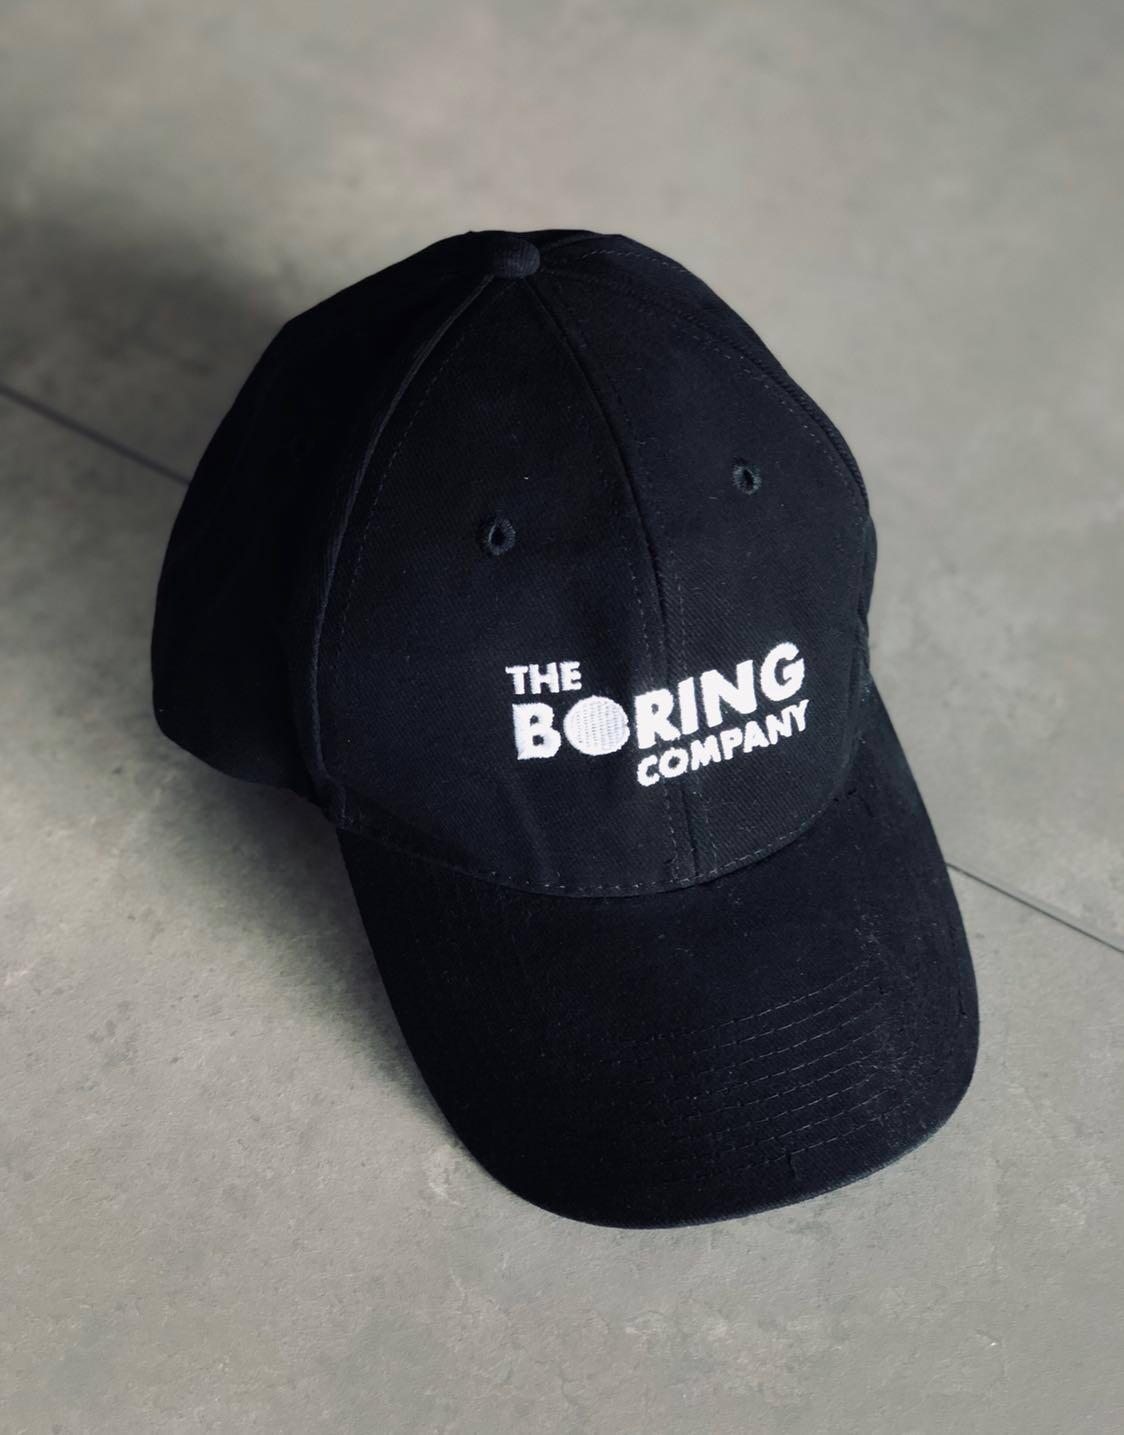 c0e11128c0788 NEW The Boring Company Hat Cap - Limited Edition Elon Musk Snapback ...